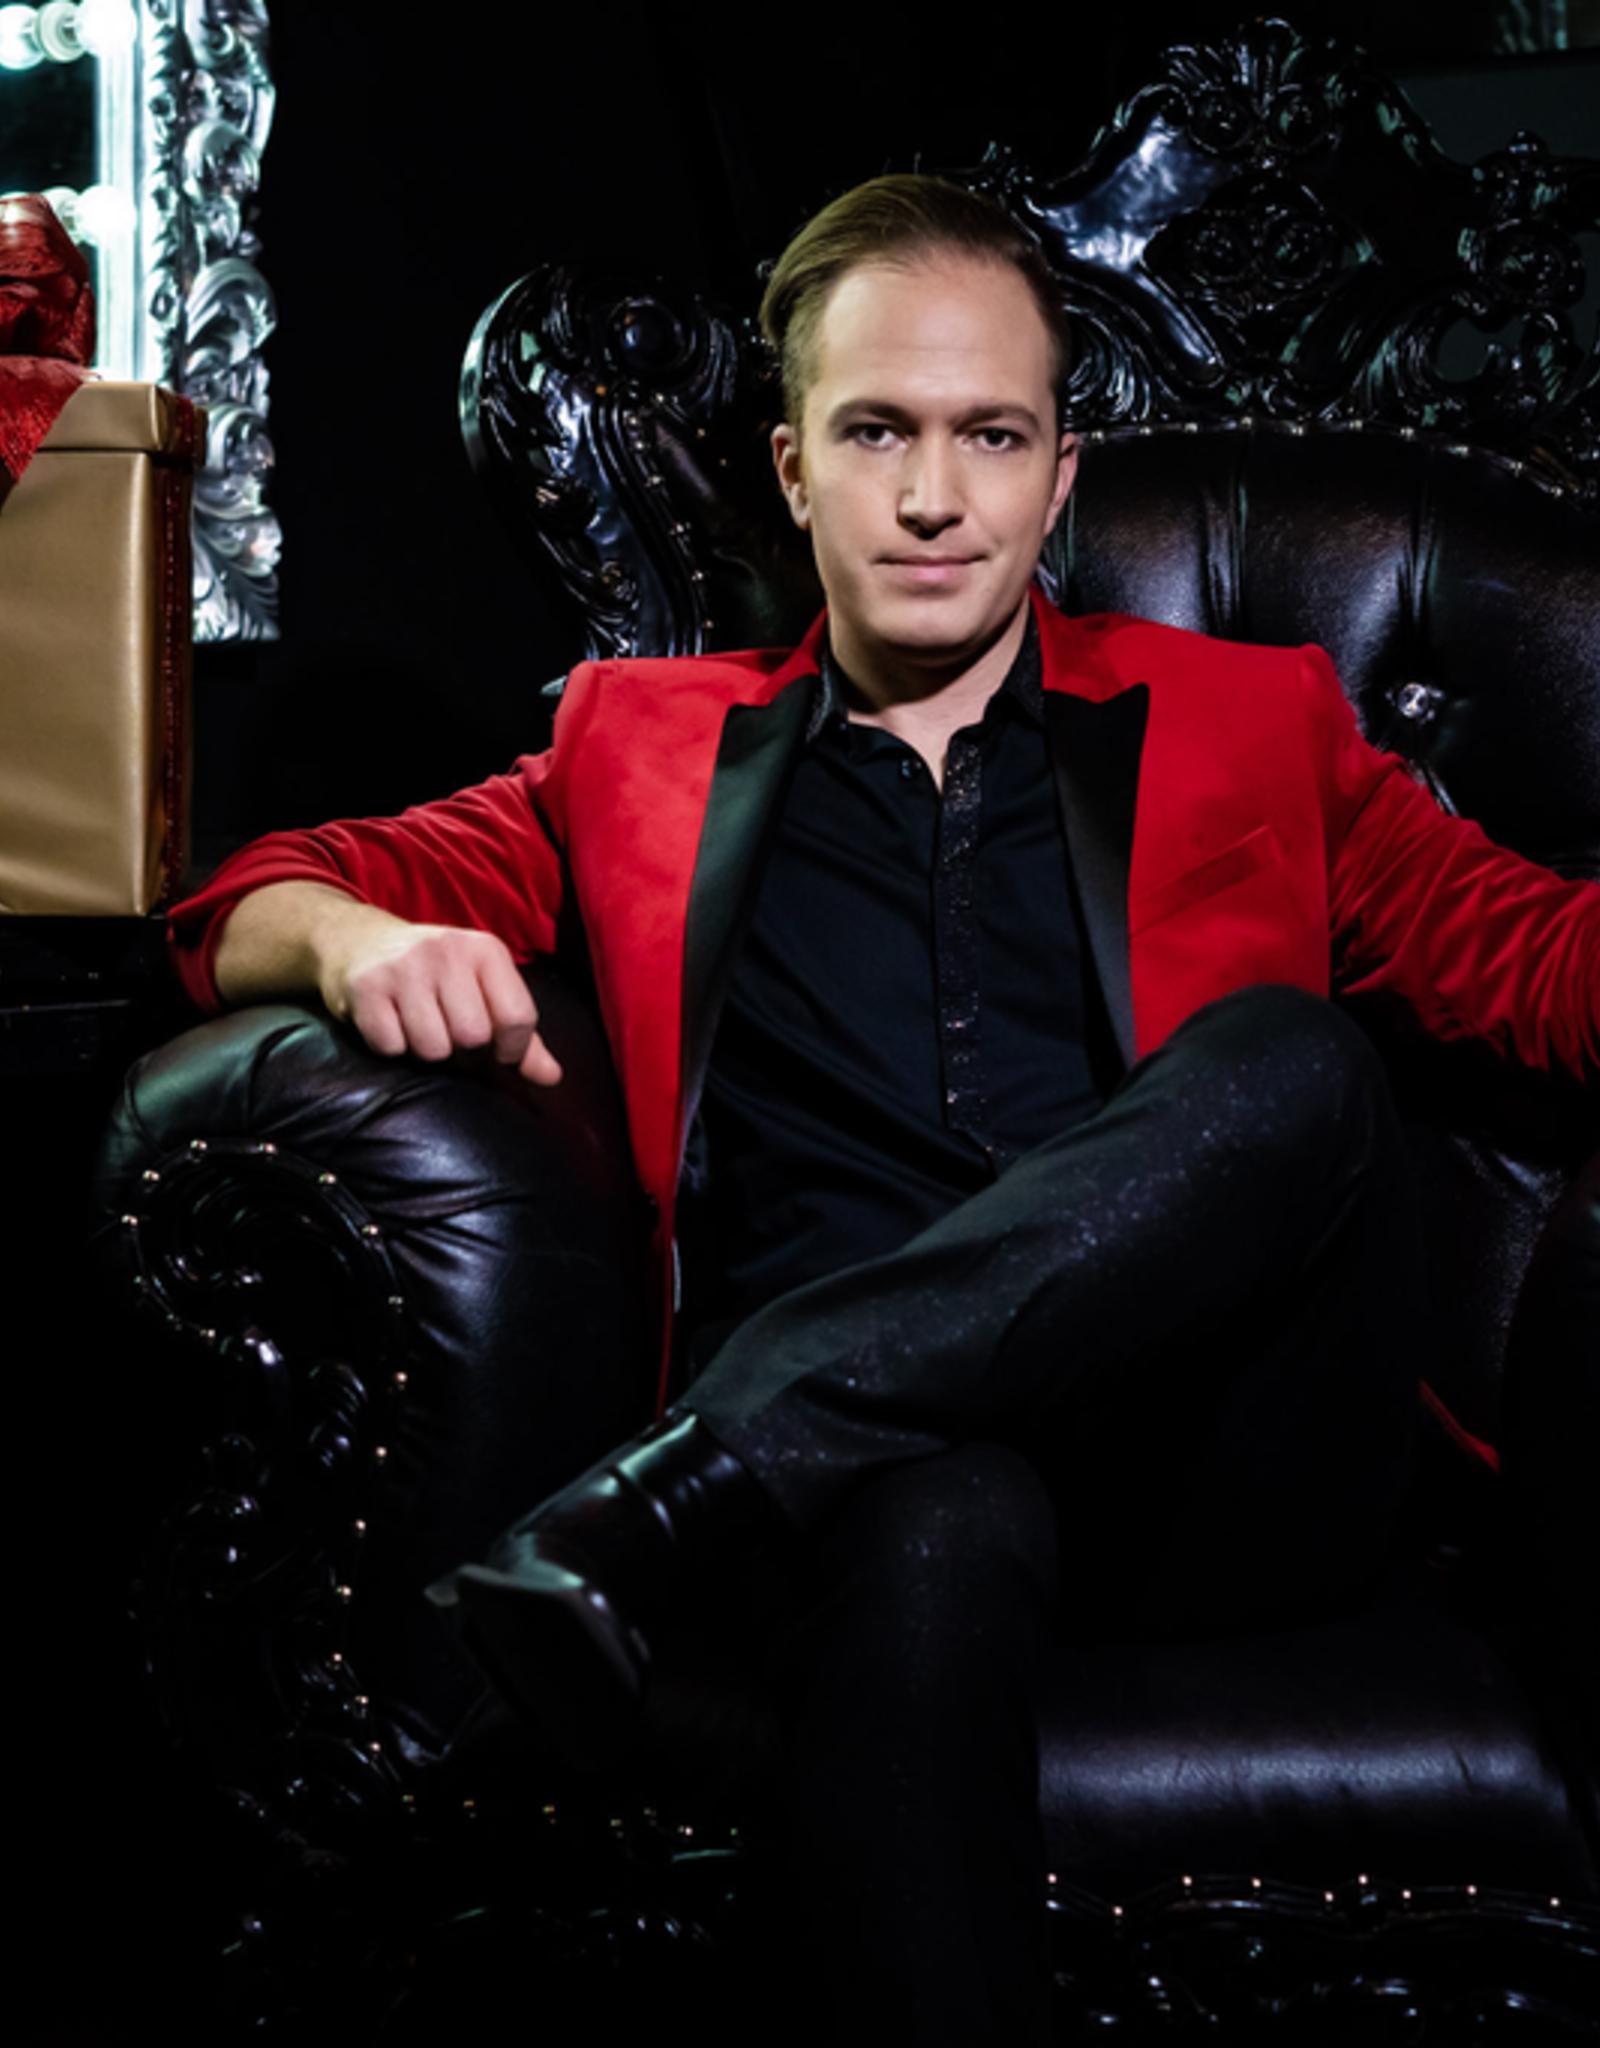 VIP Ticket: Ryne Strom Presents: The Magic & Music of Christmas VIP Ticket